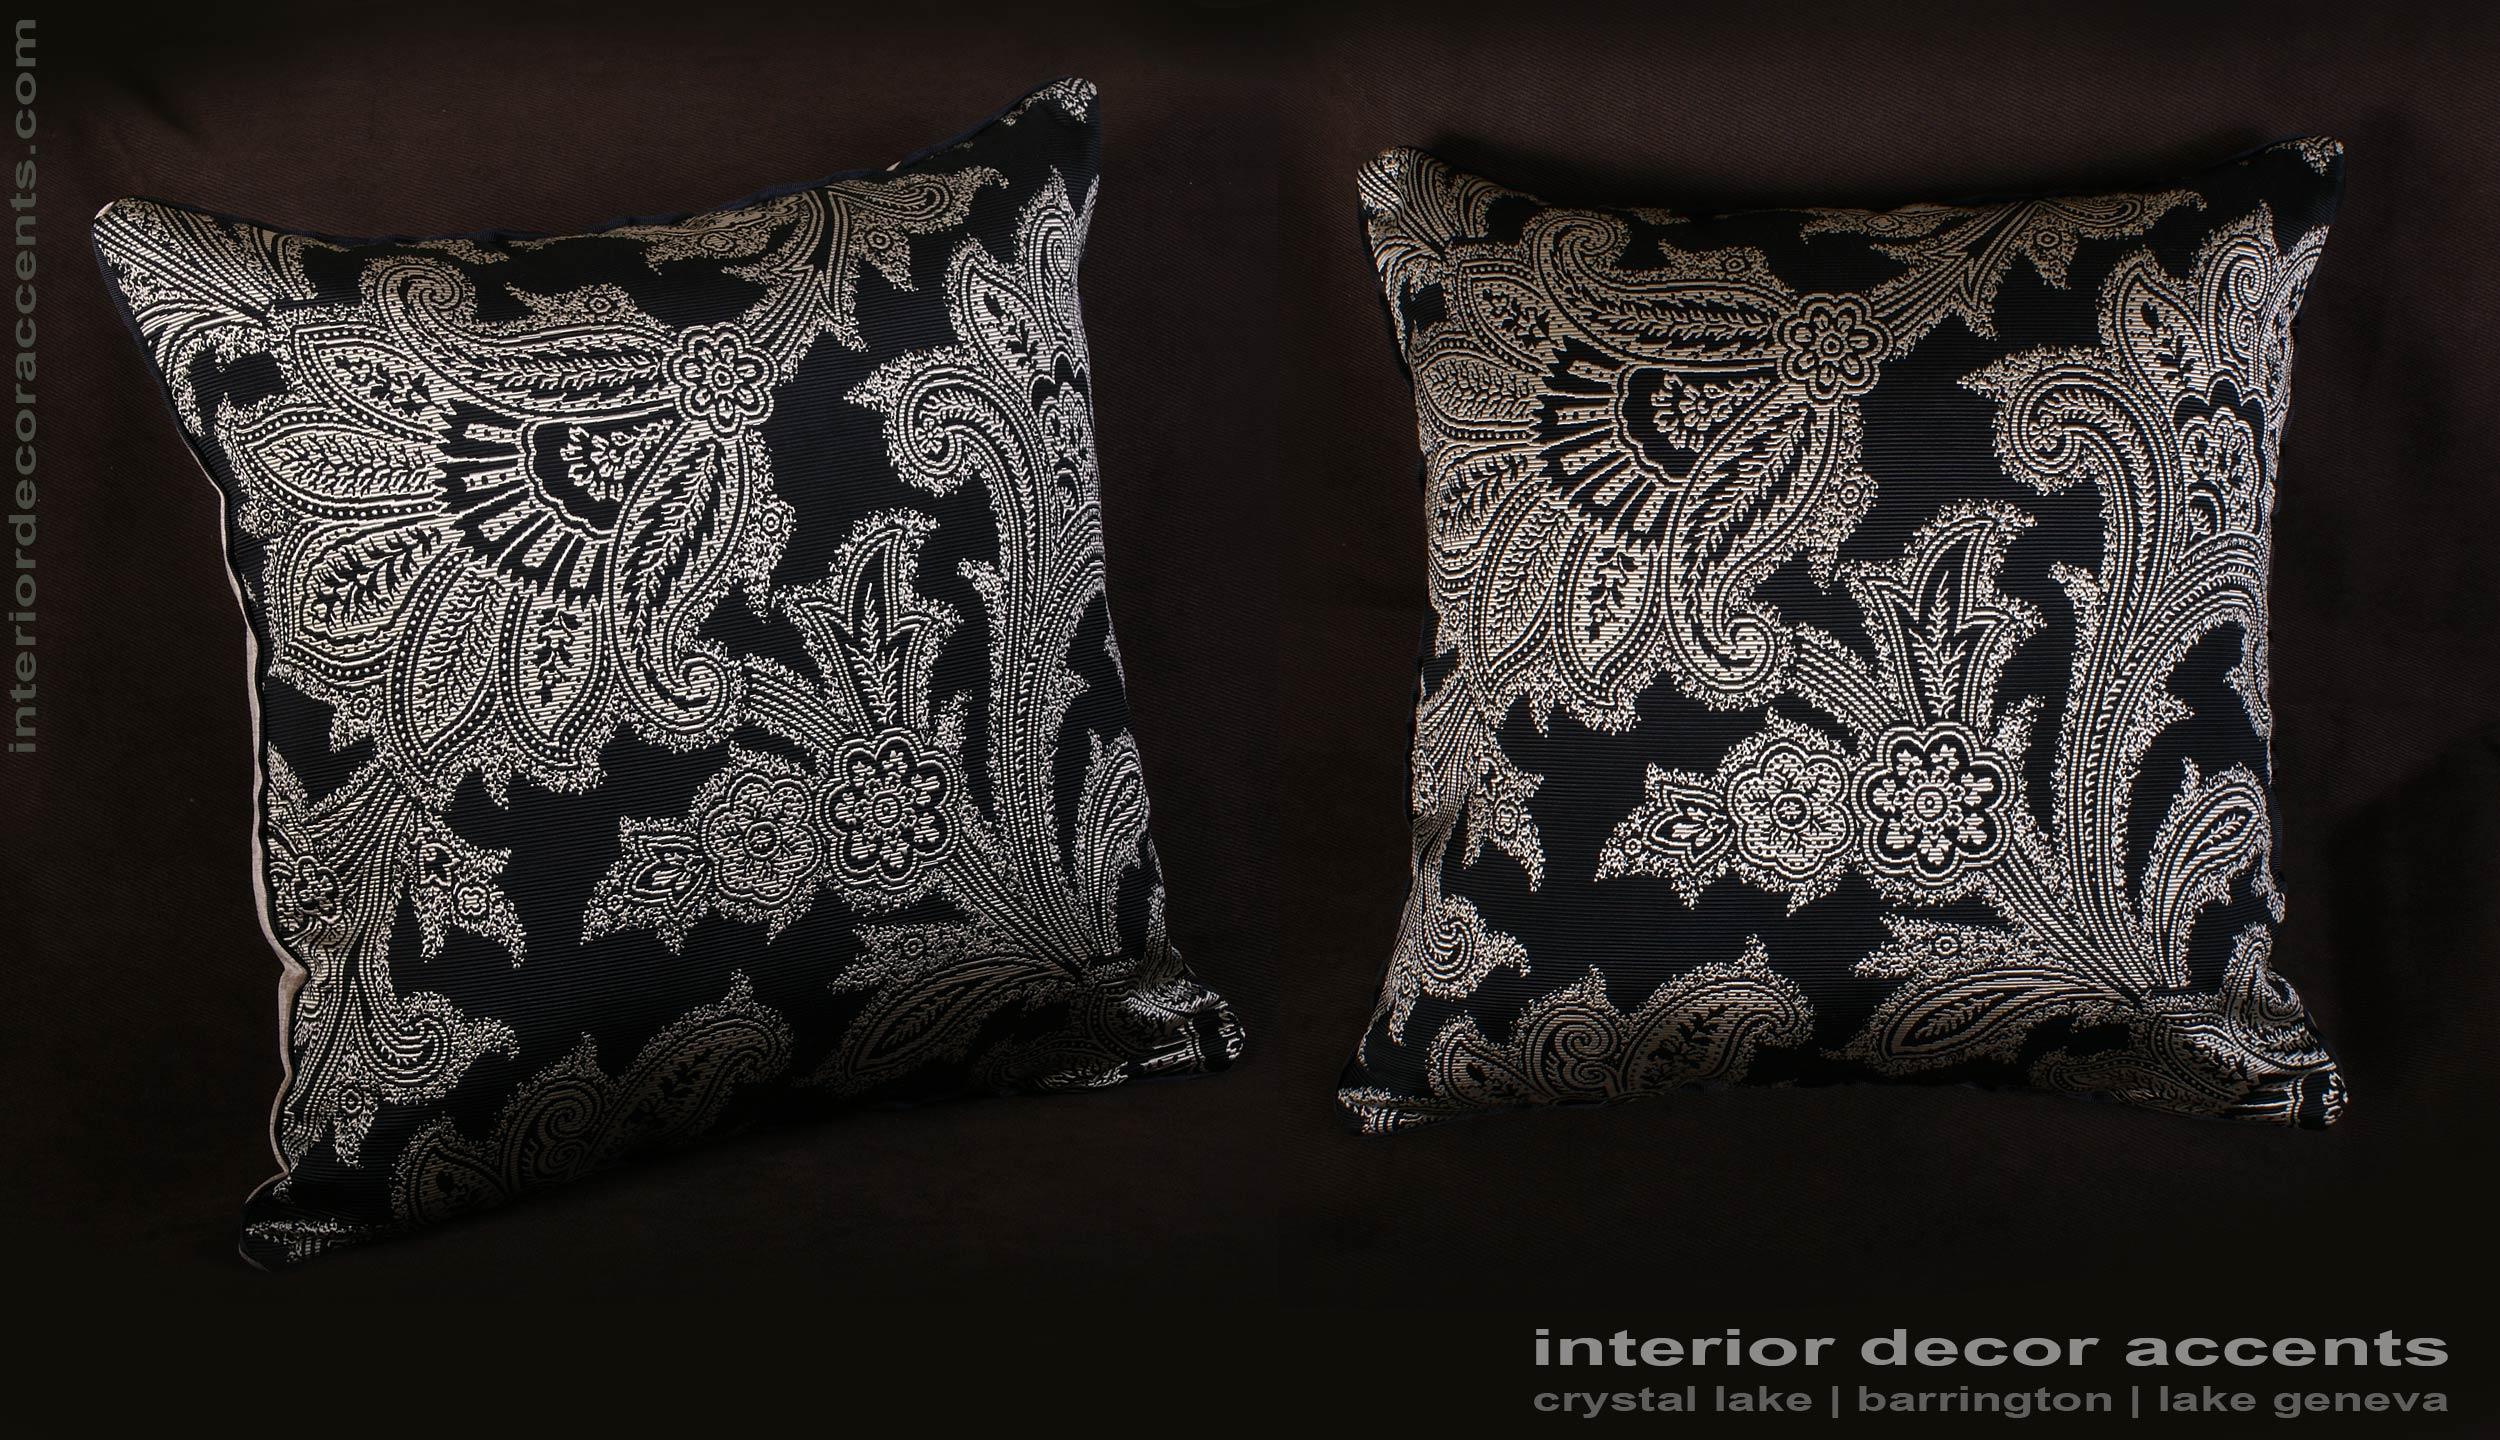 Schumacher Silk Paisley Lee Jofa Velvet Elegant Pillows